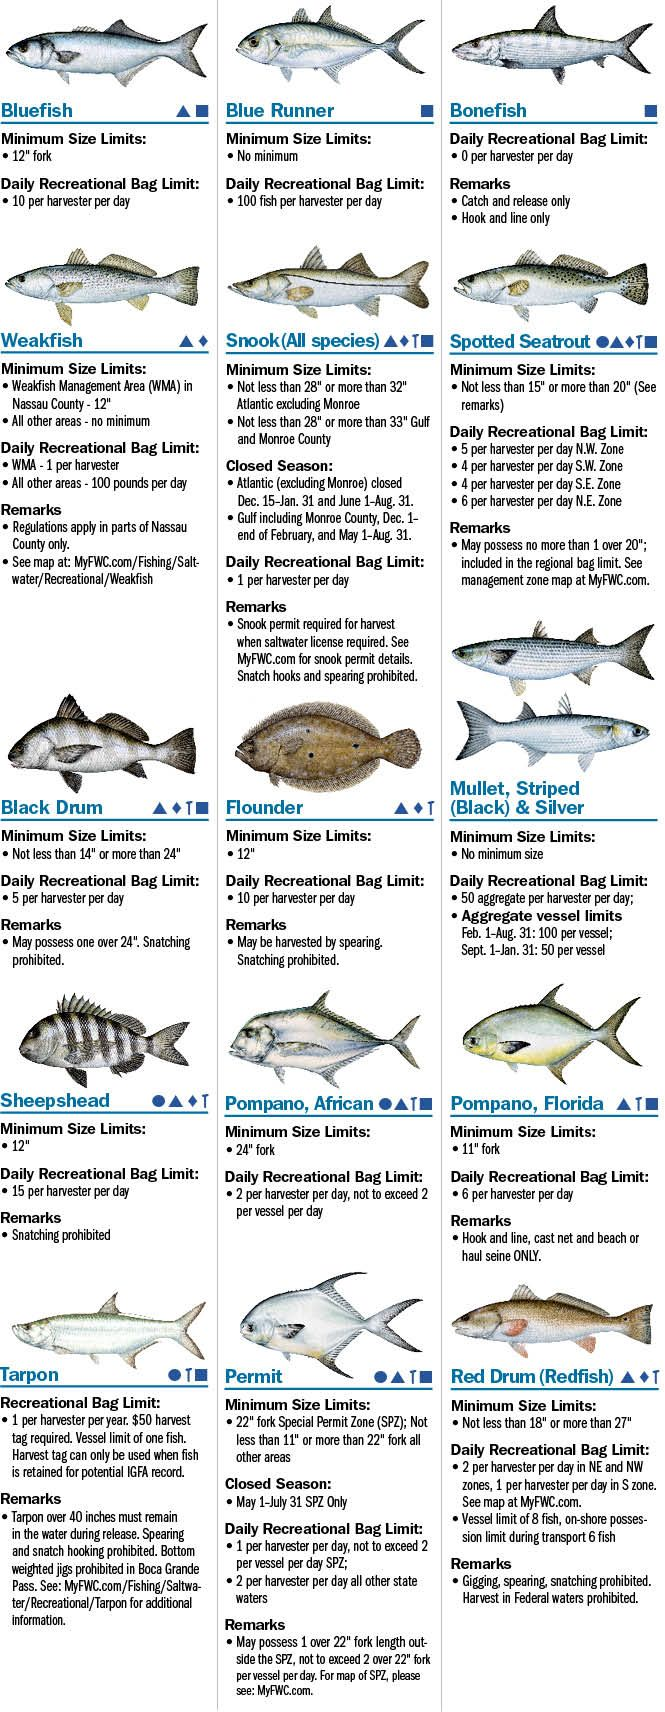 Florida fish and game regulations gamesworld for Florida game fish